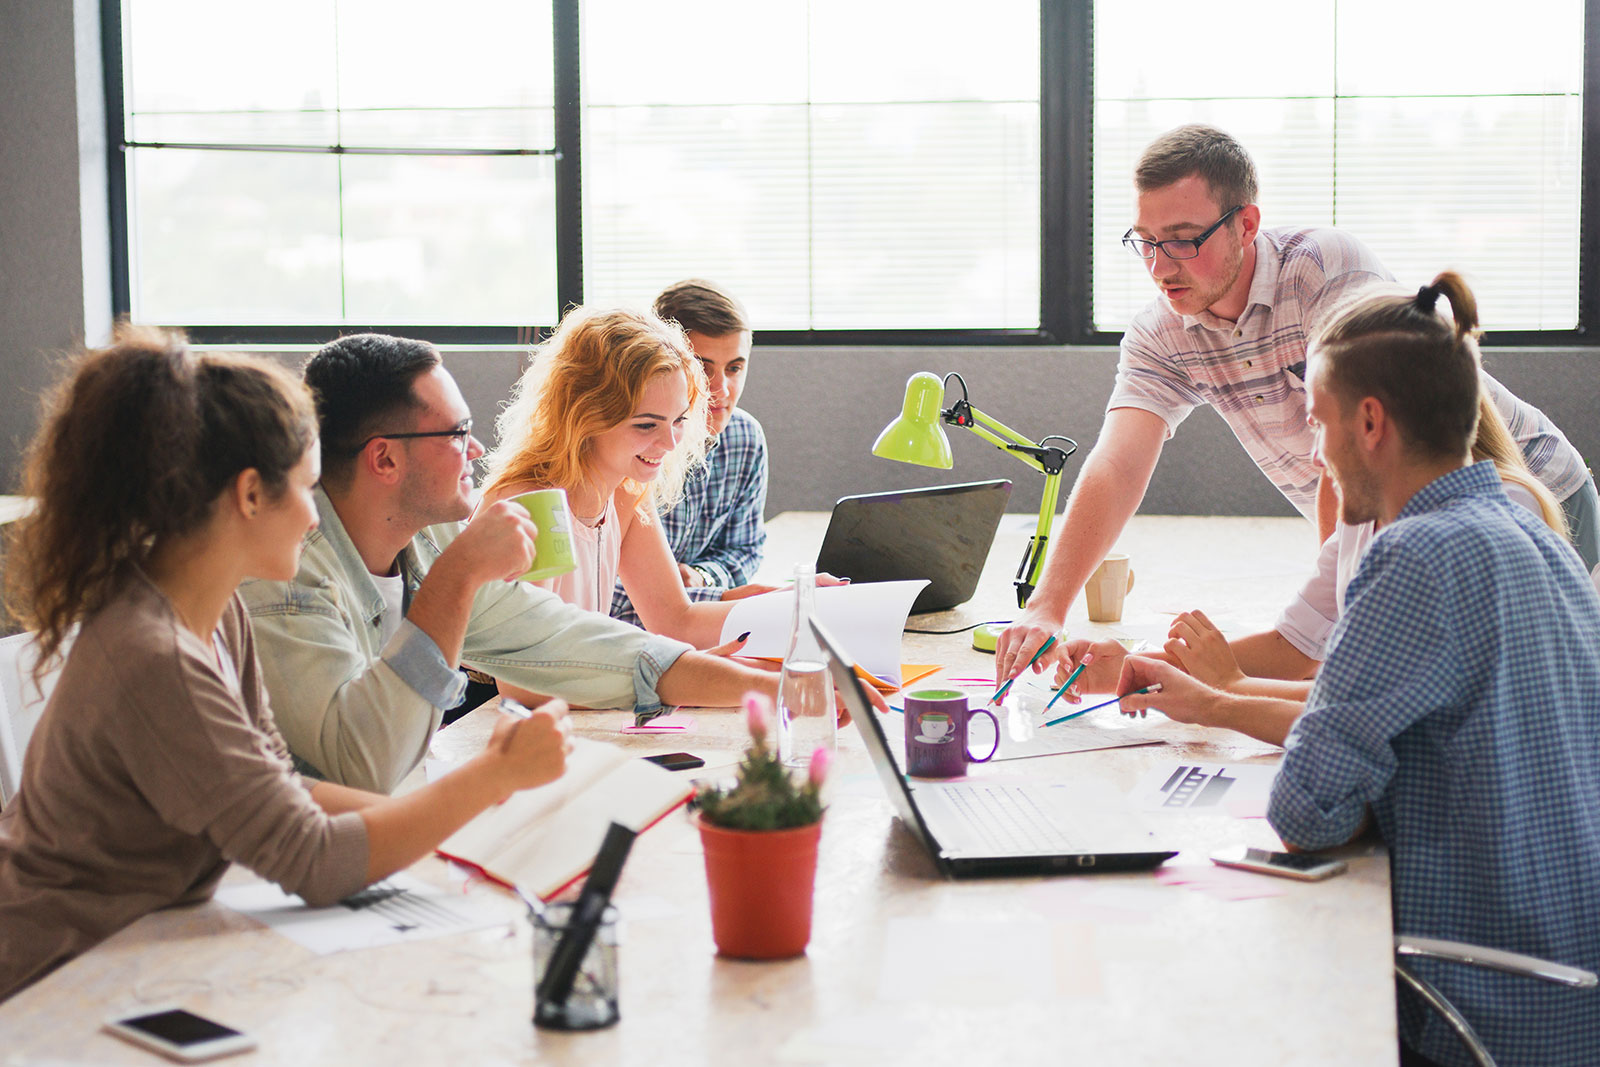 Customer Segmentation & Targeting - A Guide